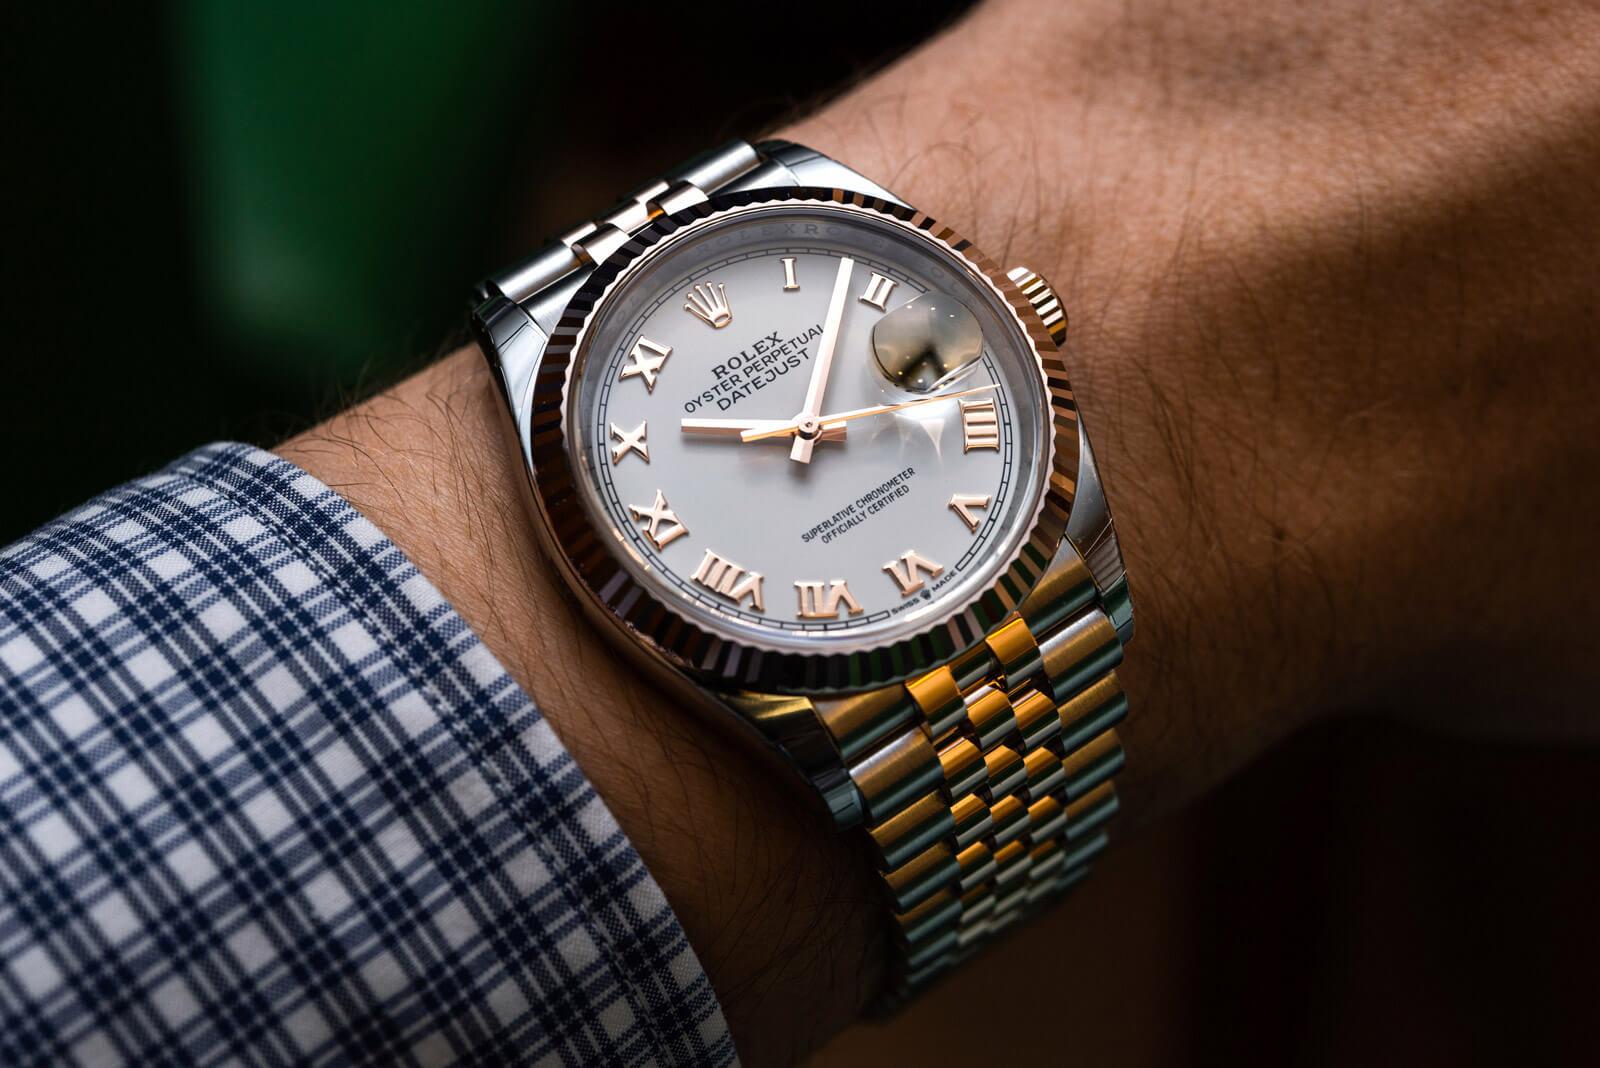 Rolex Datejust 36 <br> Referenca 126231